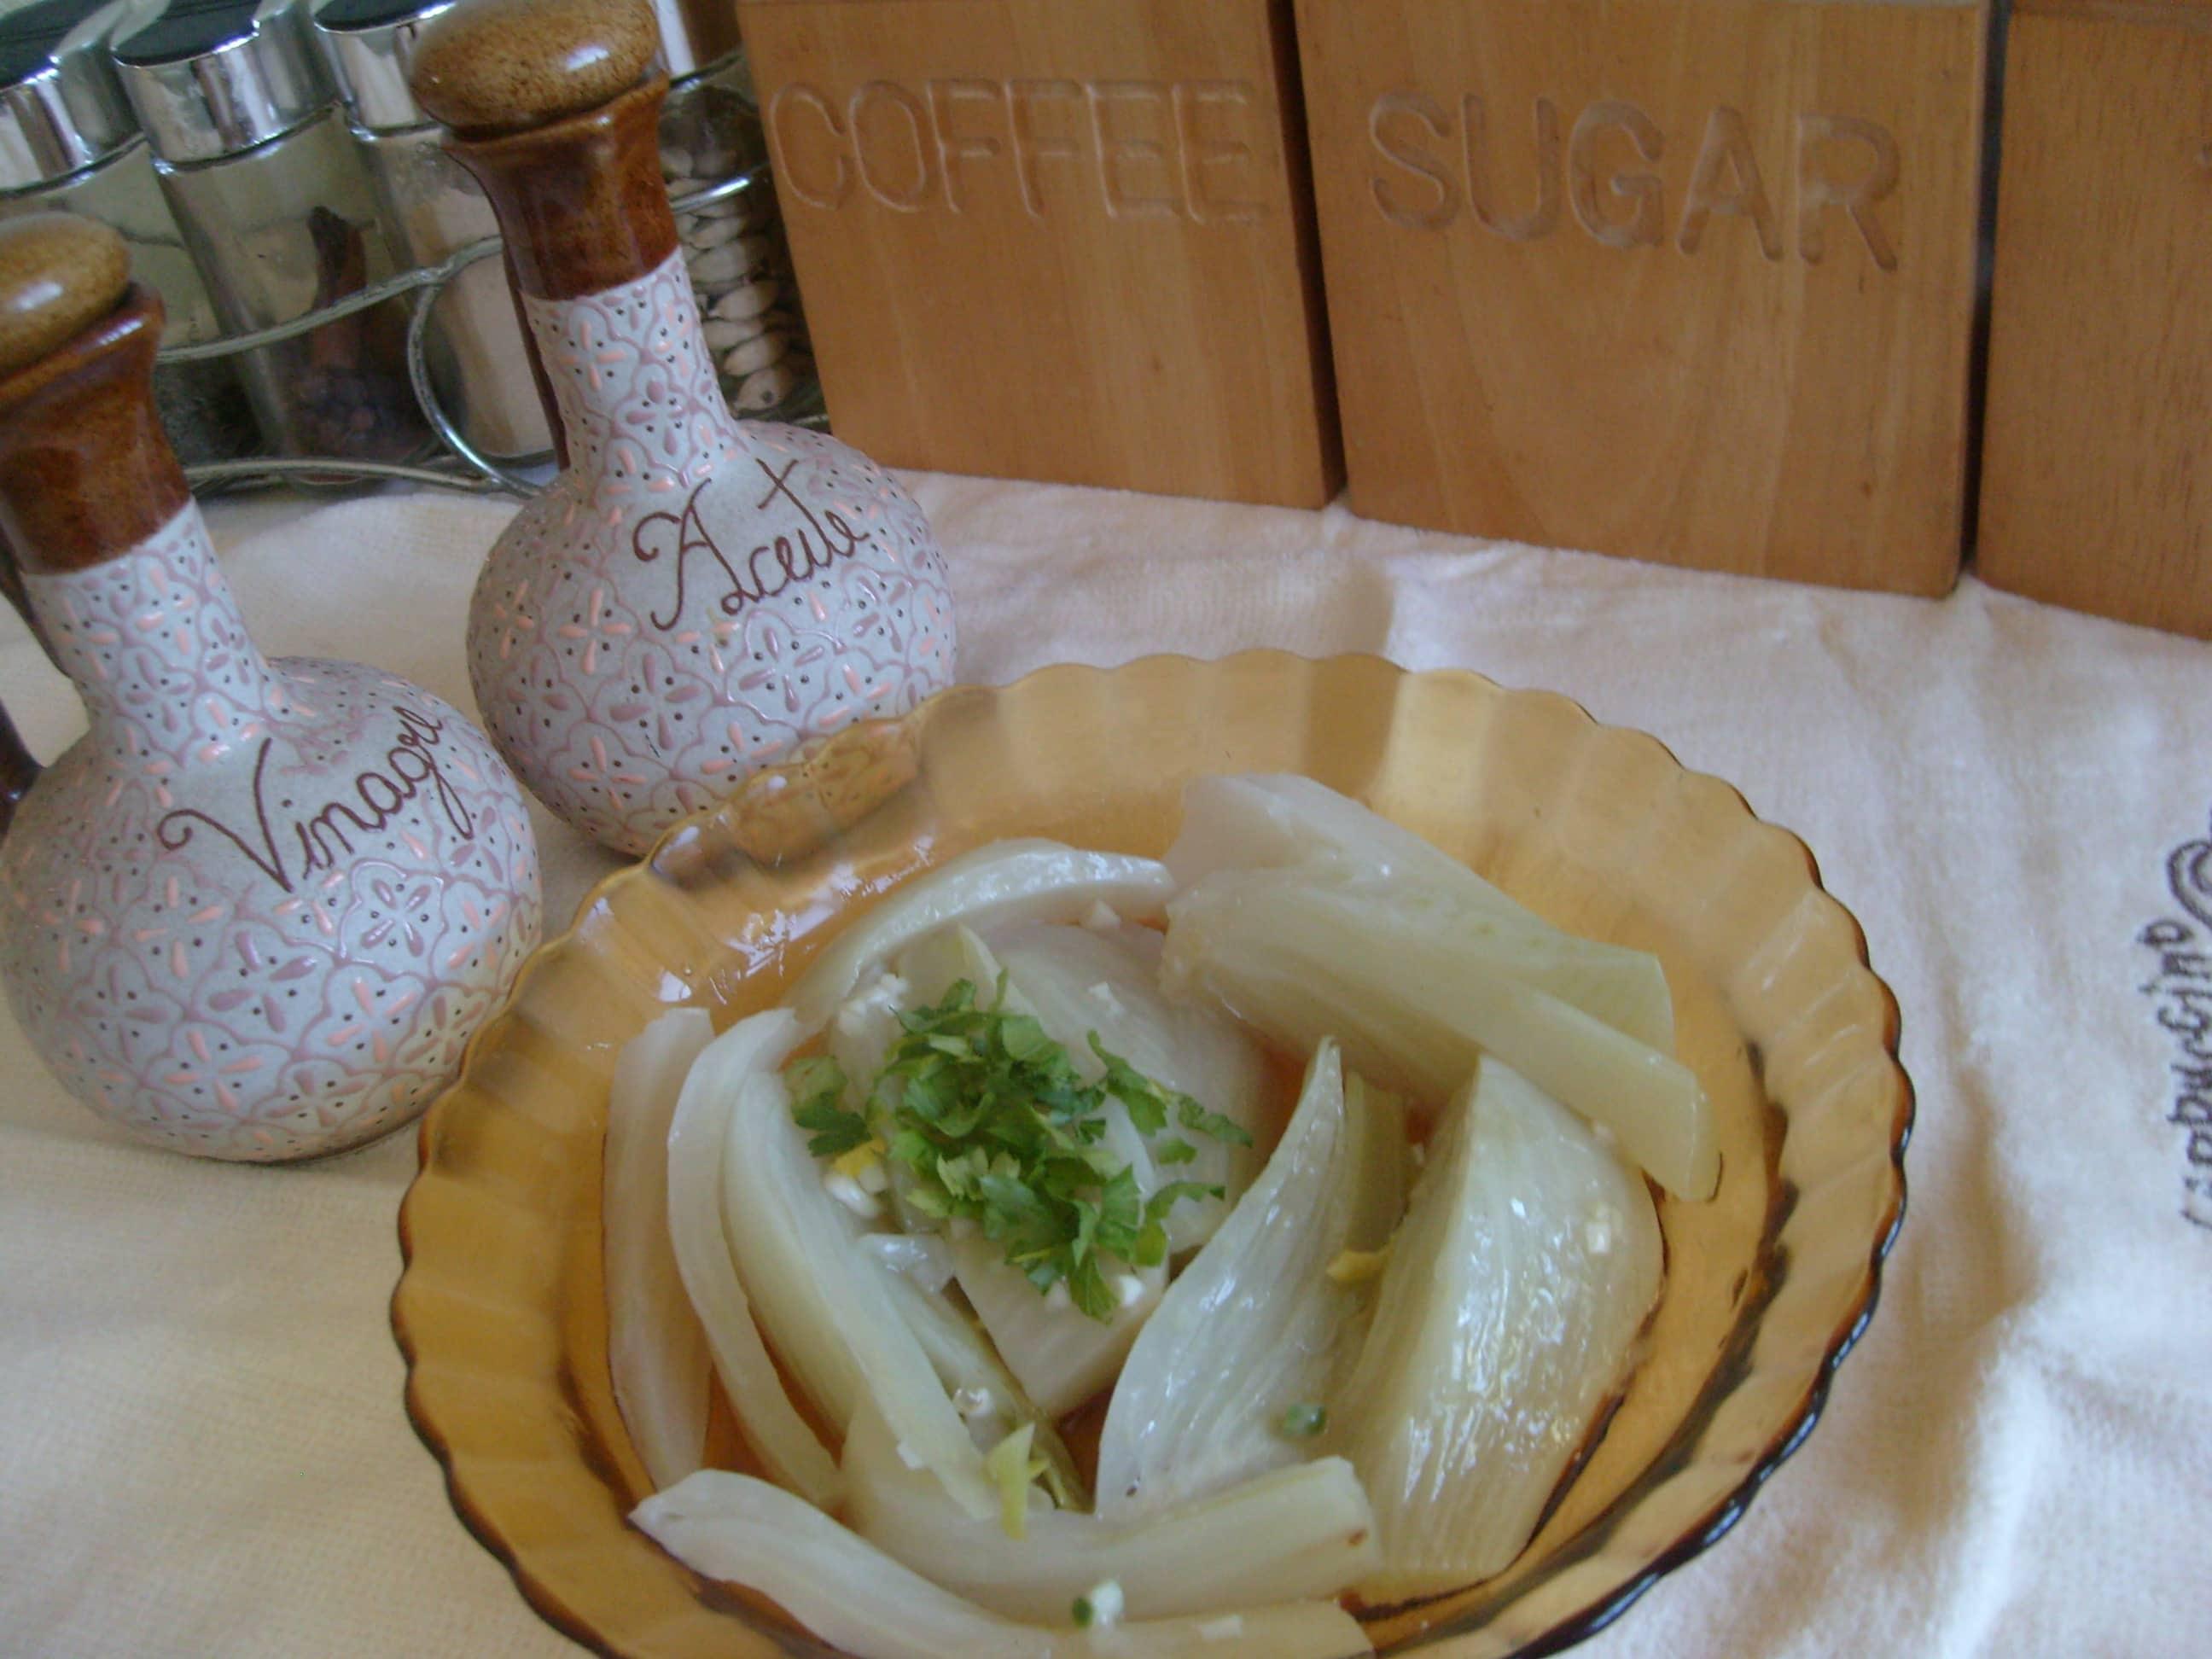 Salade de fenouil tres fondante amour de cuisine for Amoure de cuisine